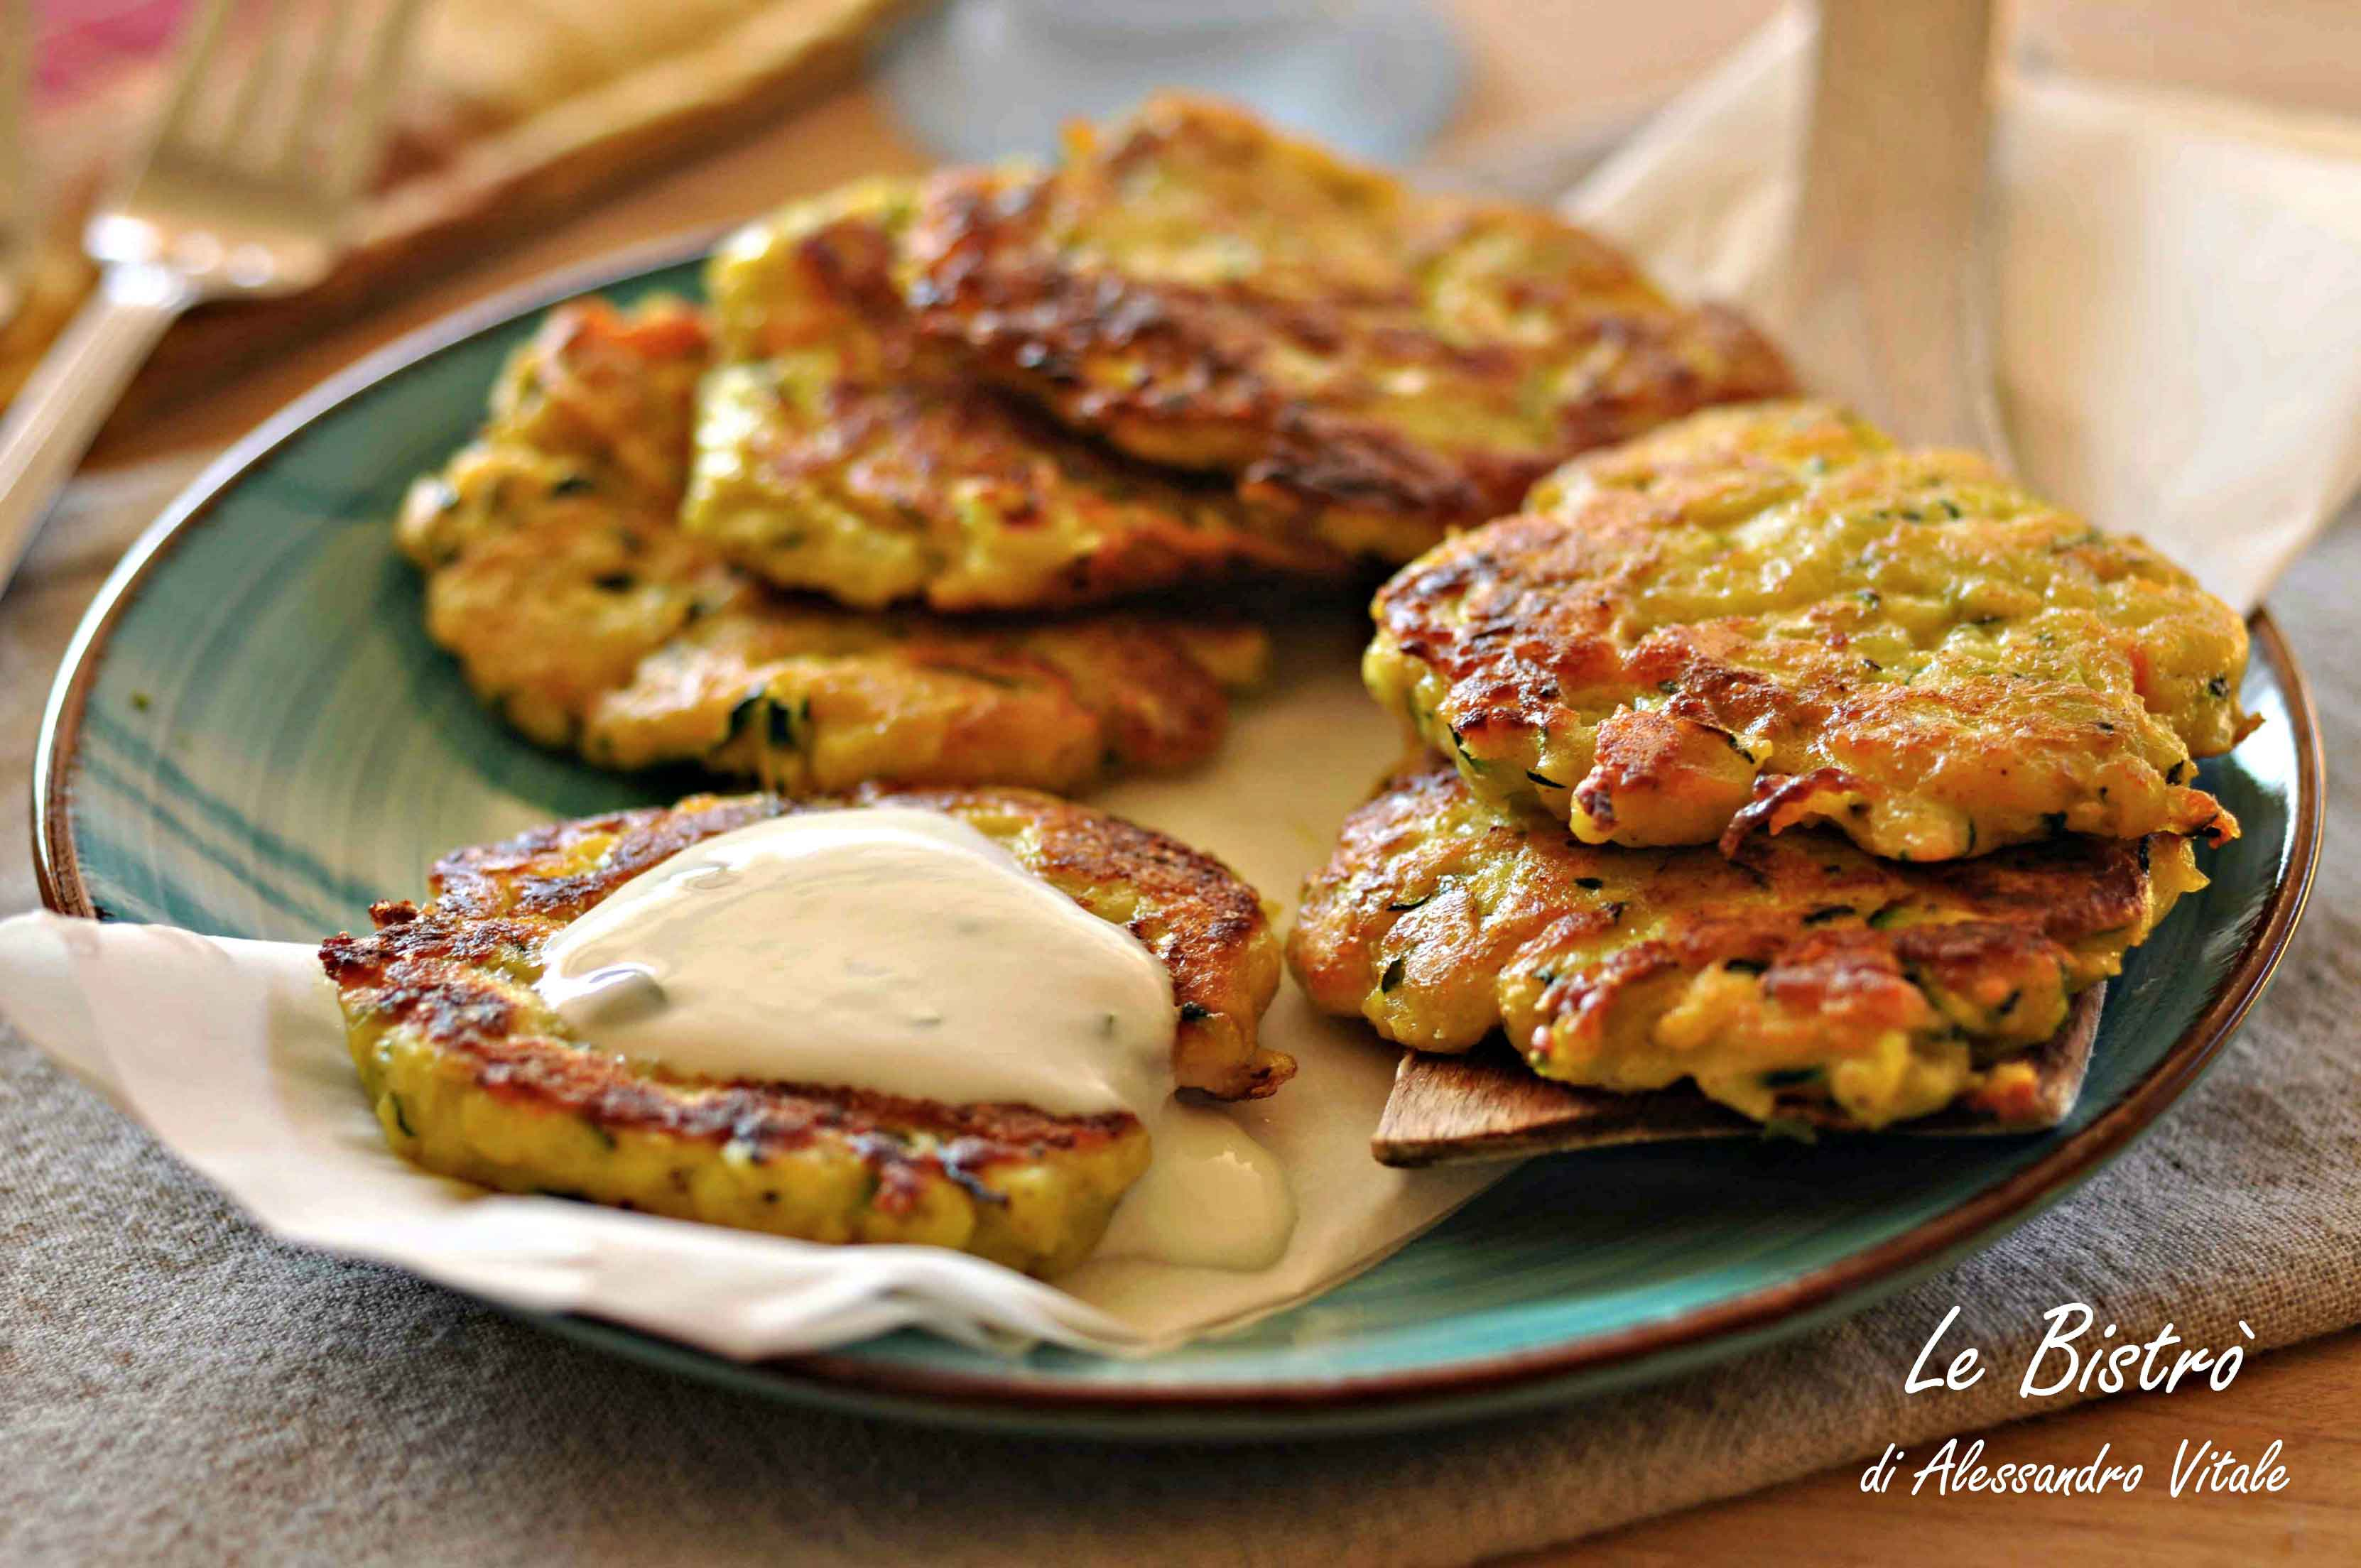 Rosti di zucchine patate e salmone for Ricette di cucina secondi piatti